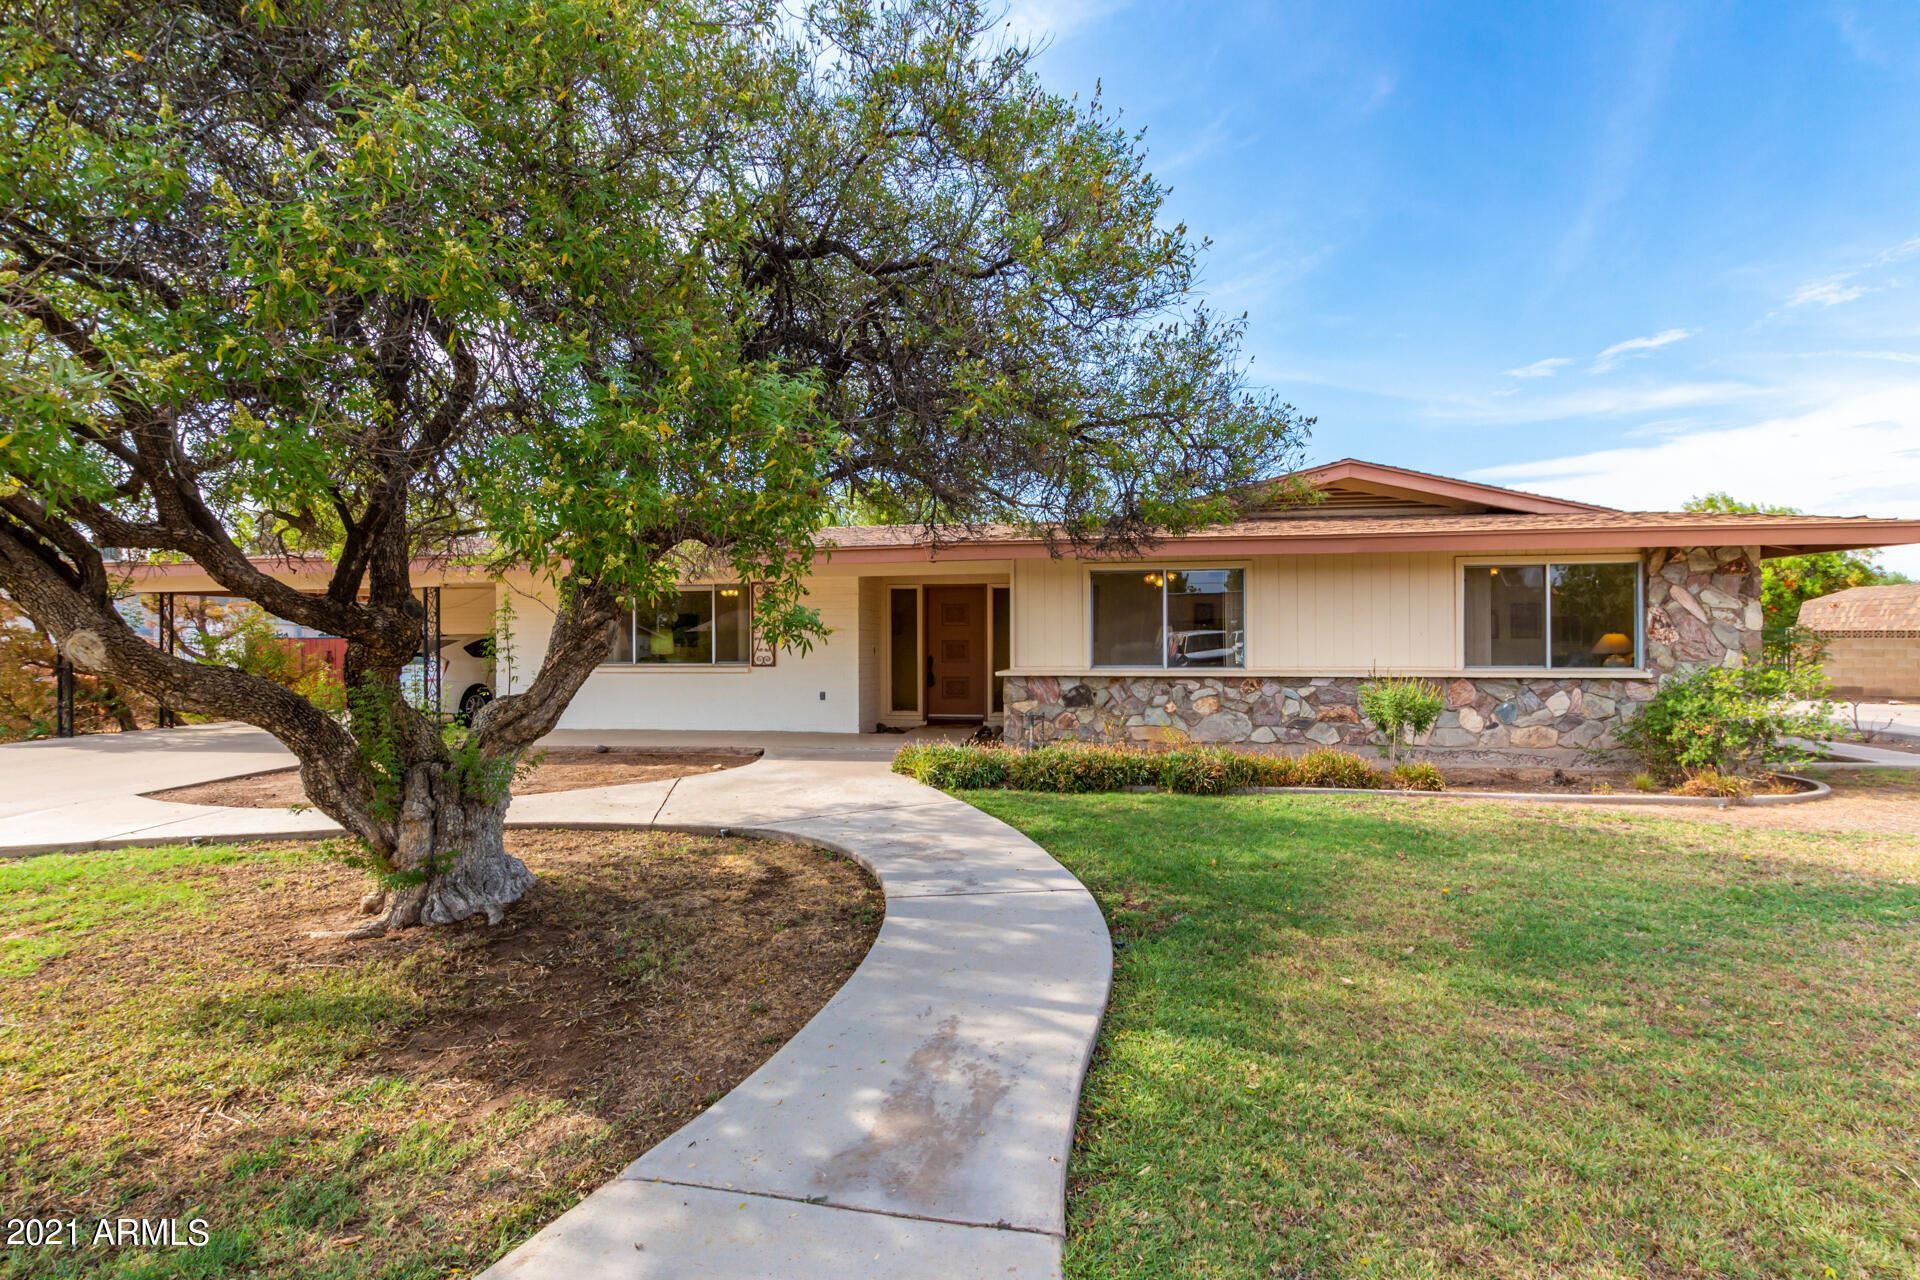 Photo of 1660 E GREENWAY Street, Mesa, AZ 85203 (MLS # 6269308)